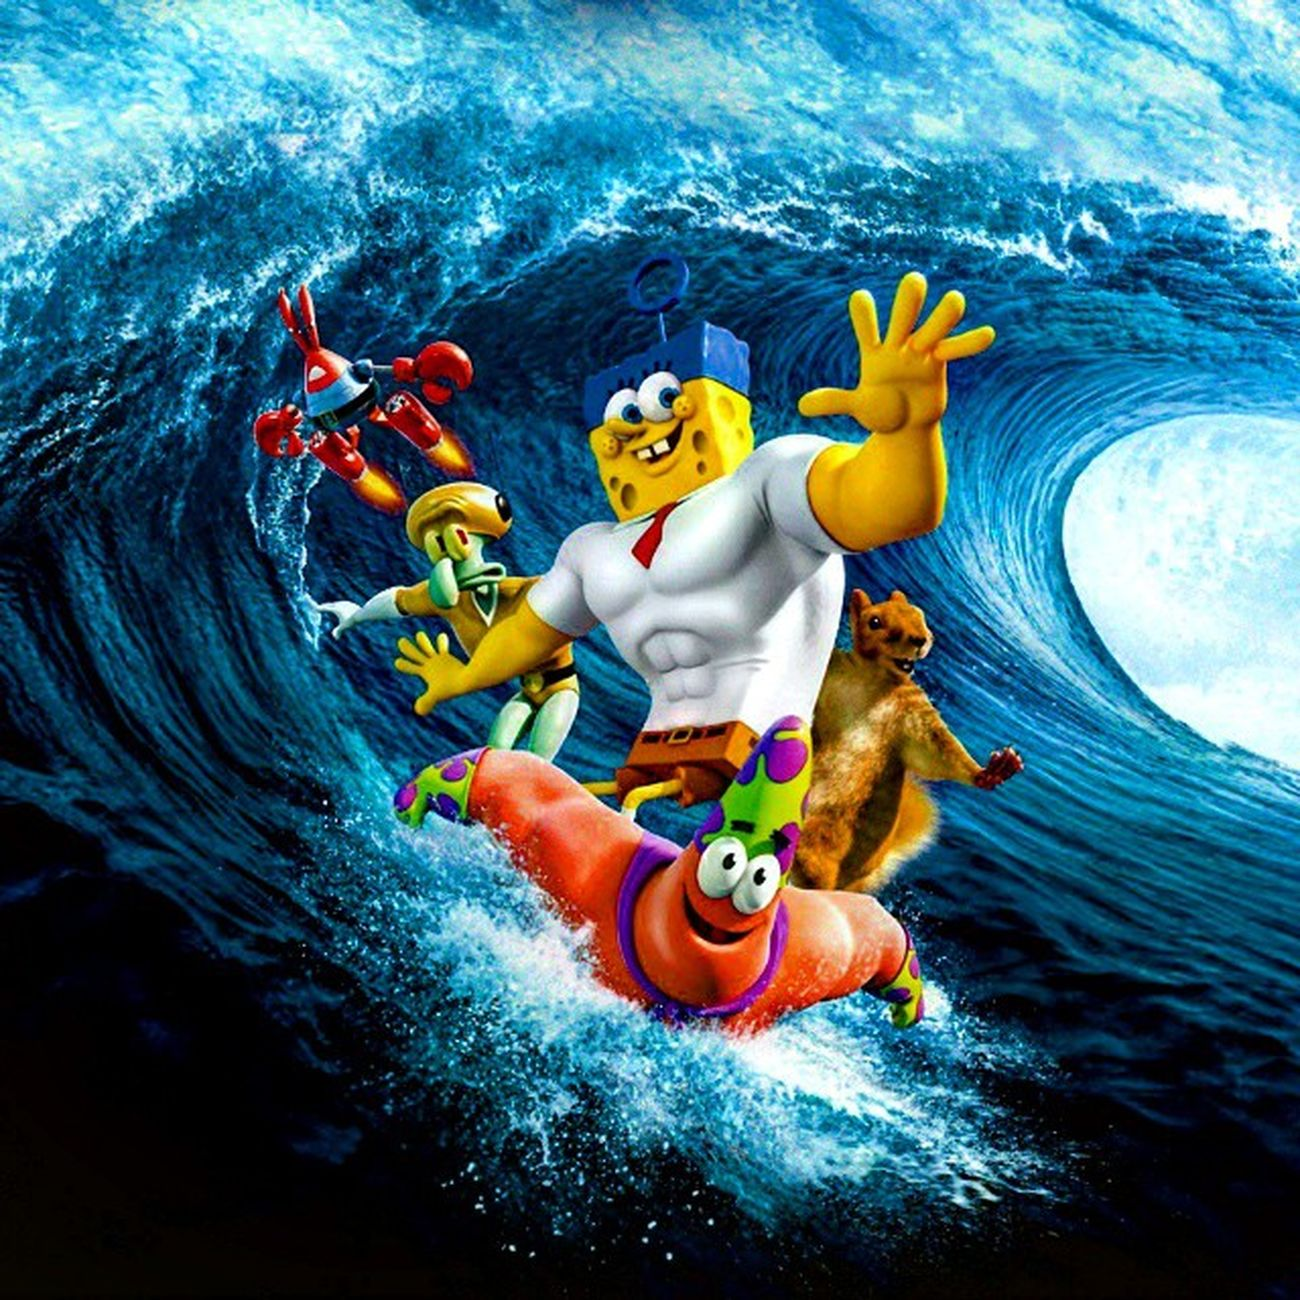 Spongebob Patrick Serfing губкабоб патрик Серфинг